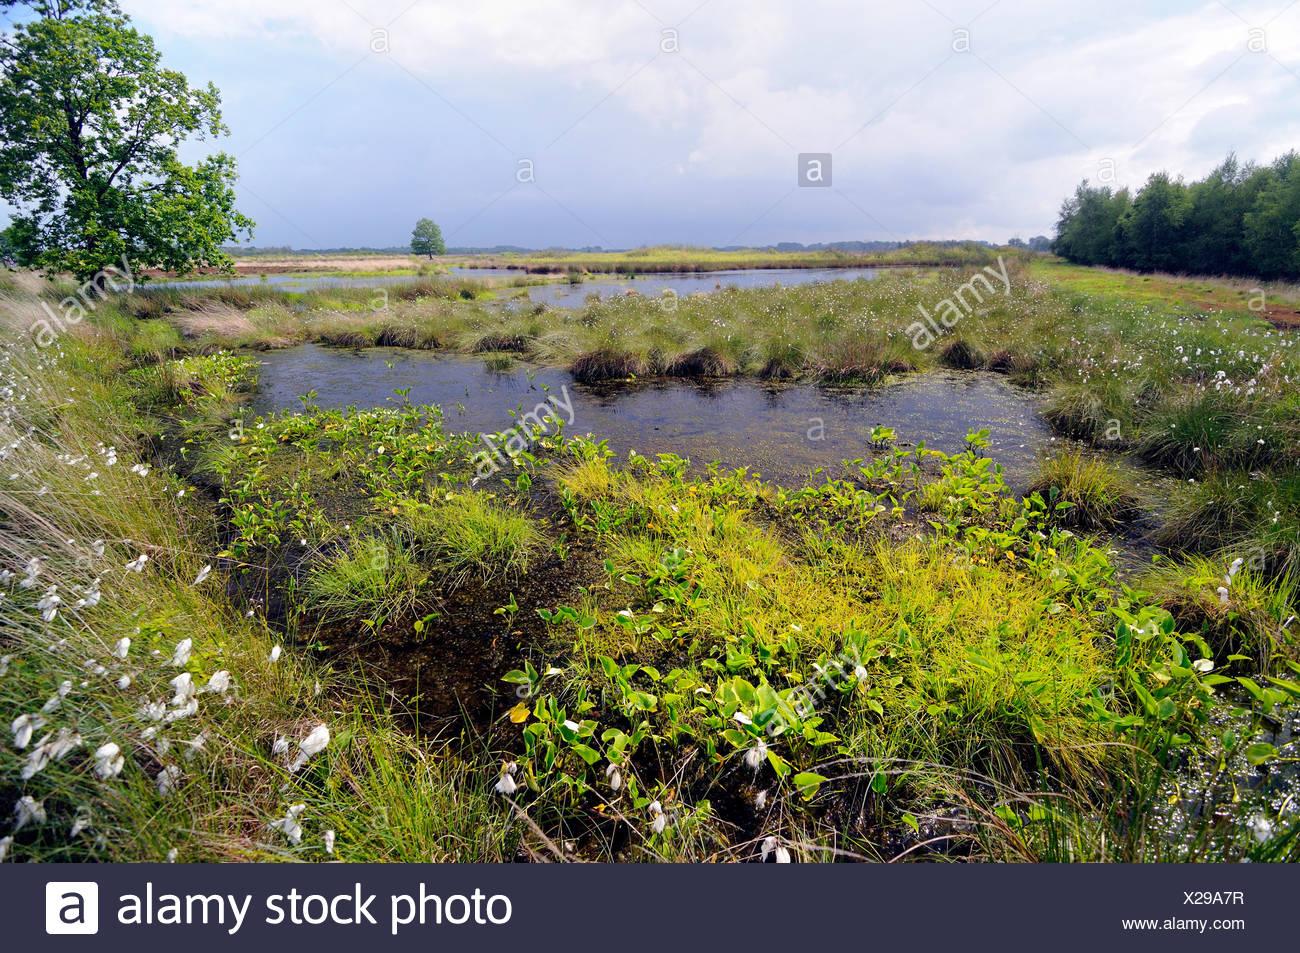 bog arum, wild calla (Calla palustris), blooming at mire border, Germany, Lower Saxony, Grosses Torfmoor Stock Photo